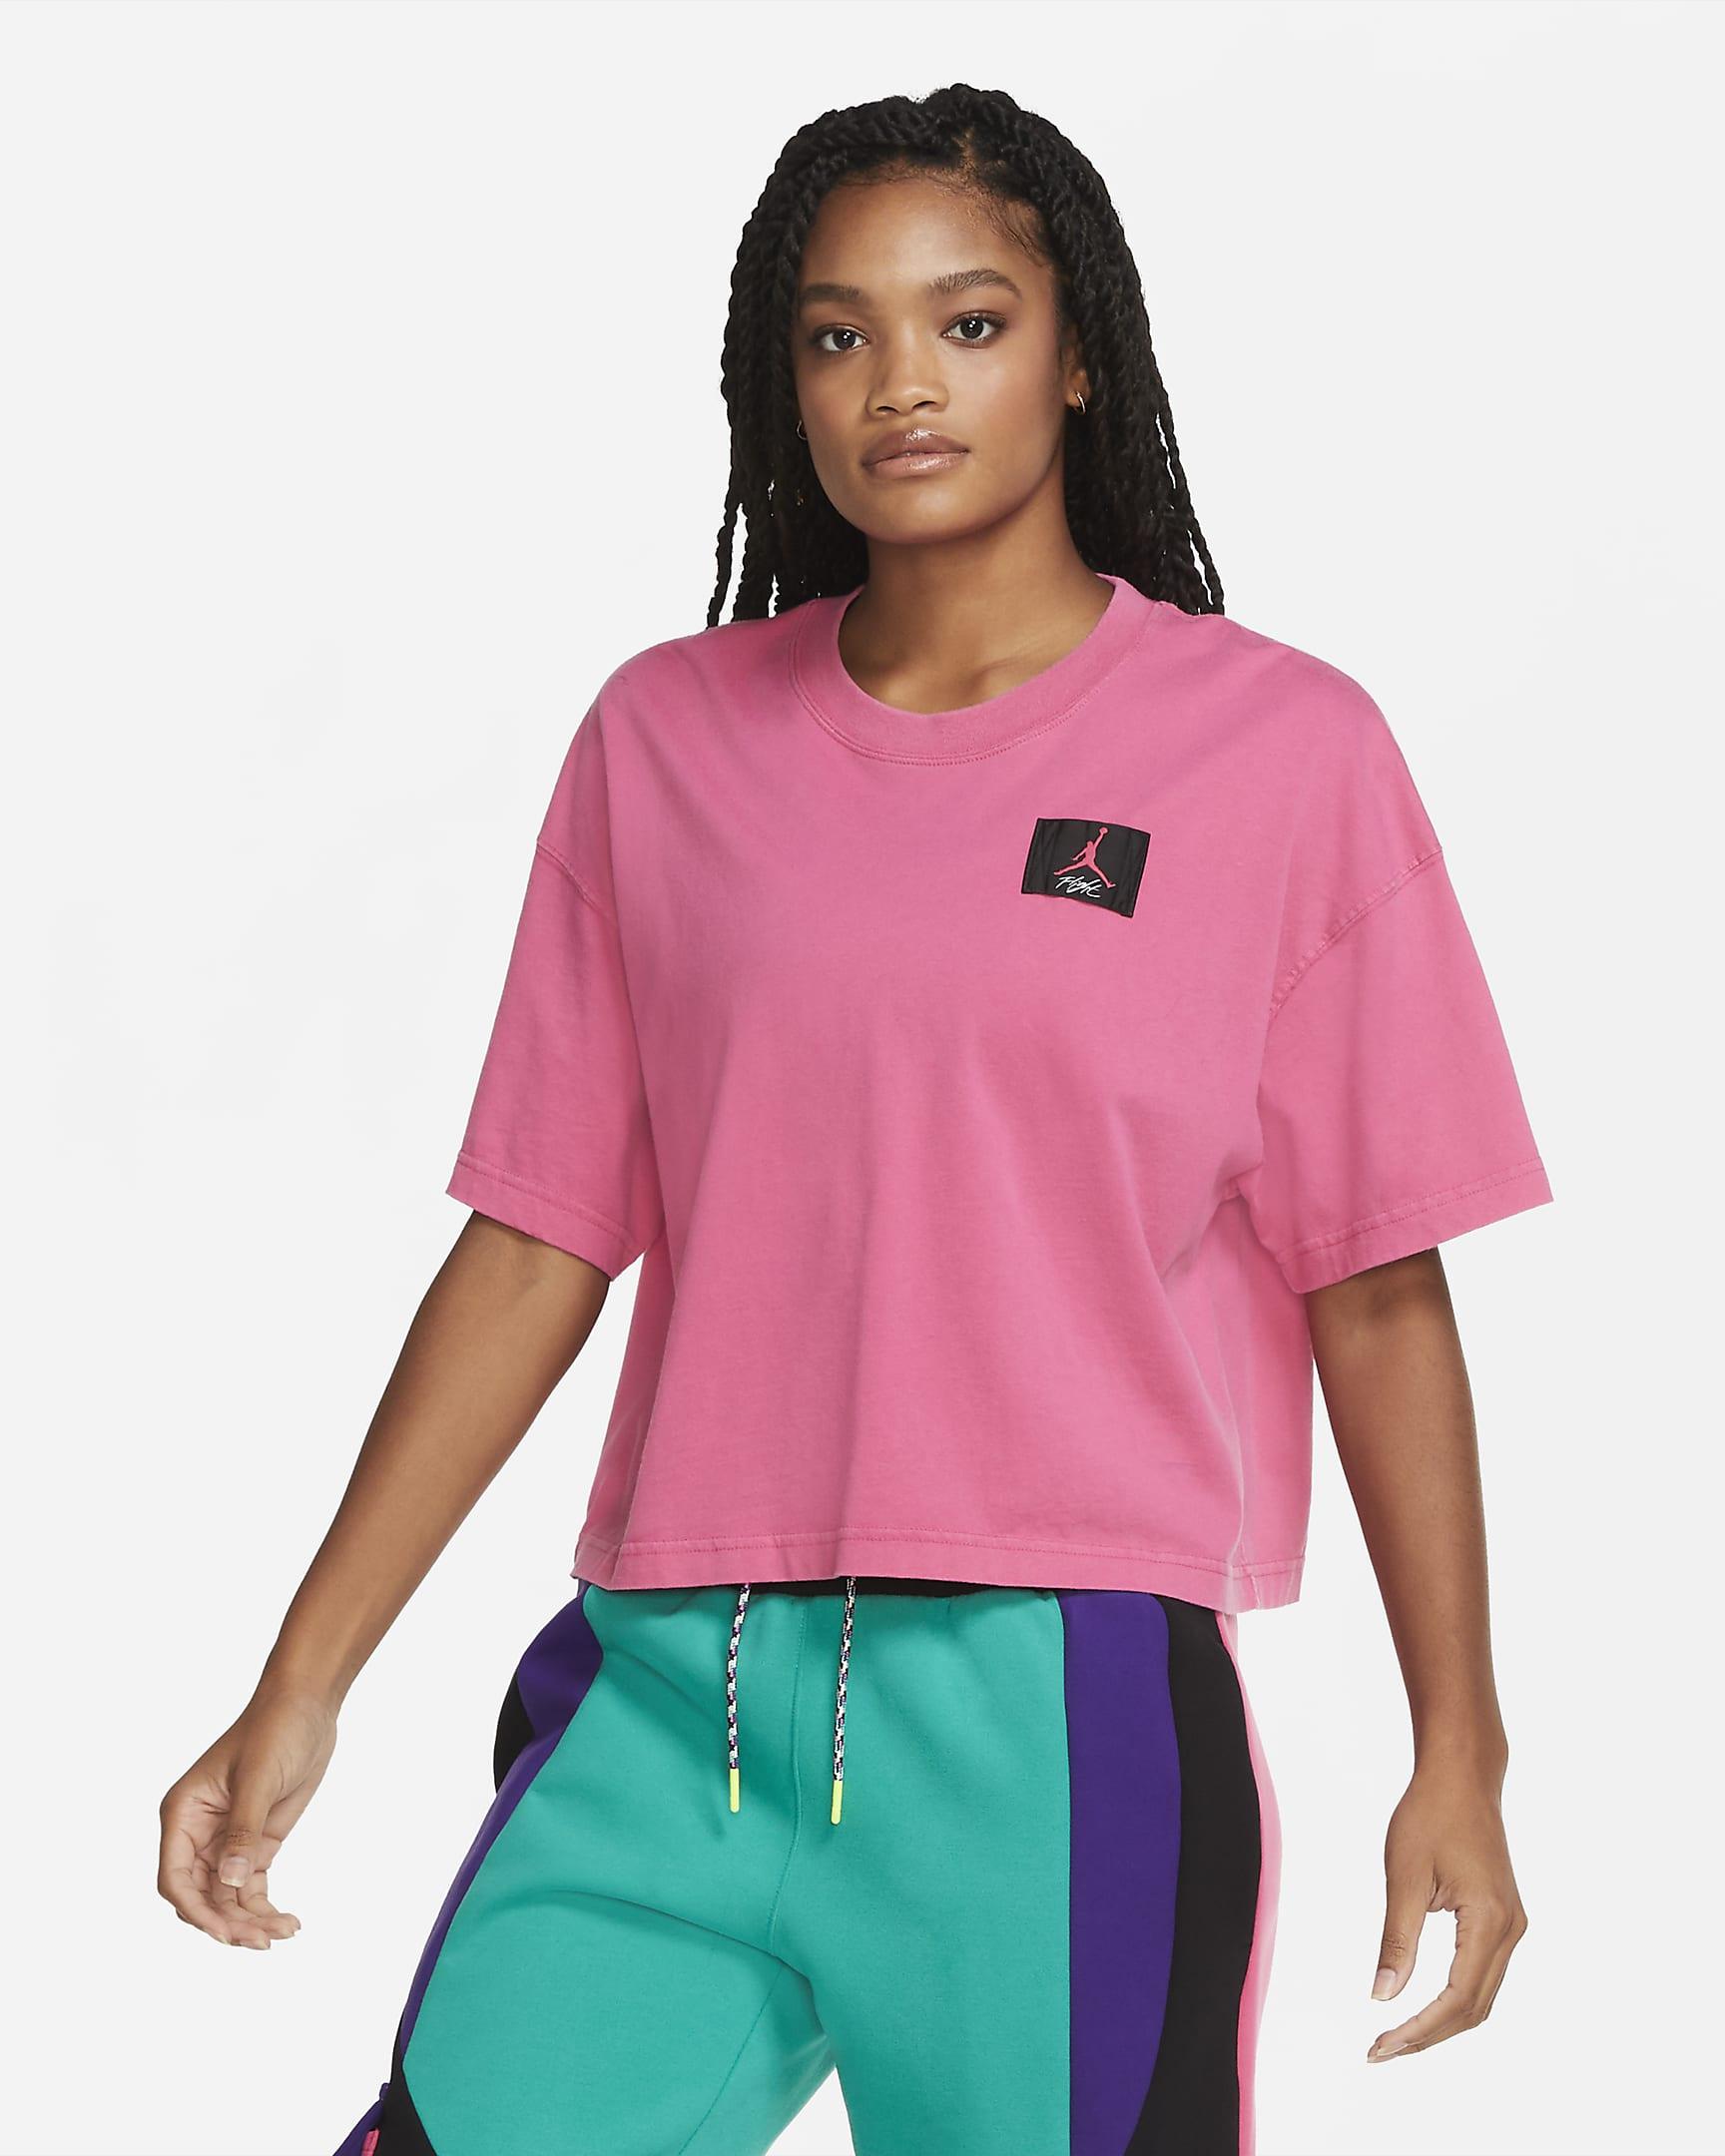 jordan-essential-womens-short-sleeve-boxy-t-shirt-9xLPQl-1